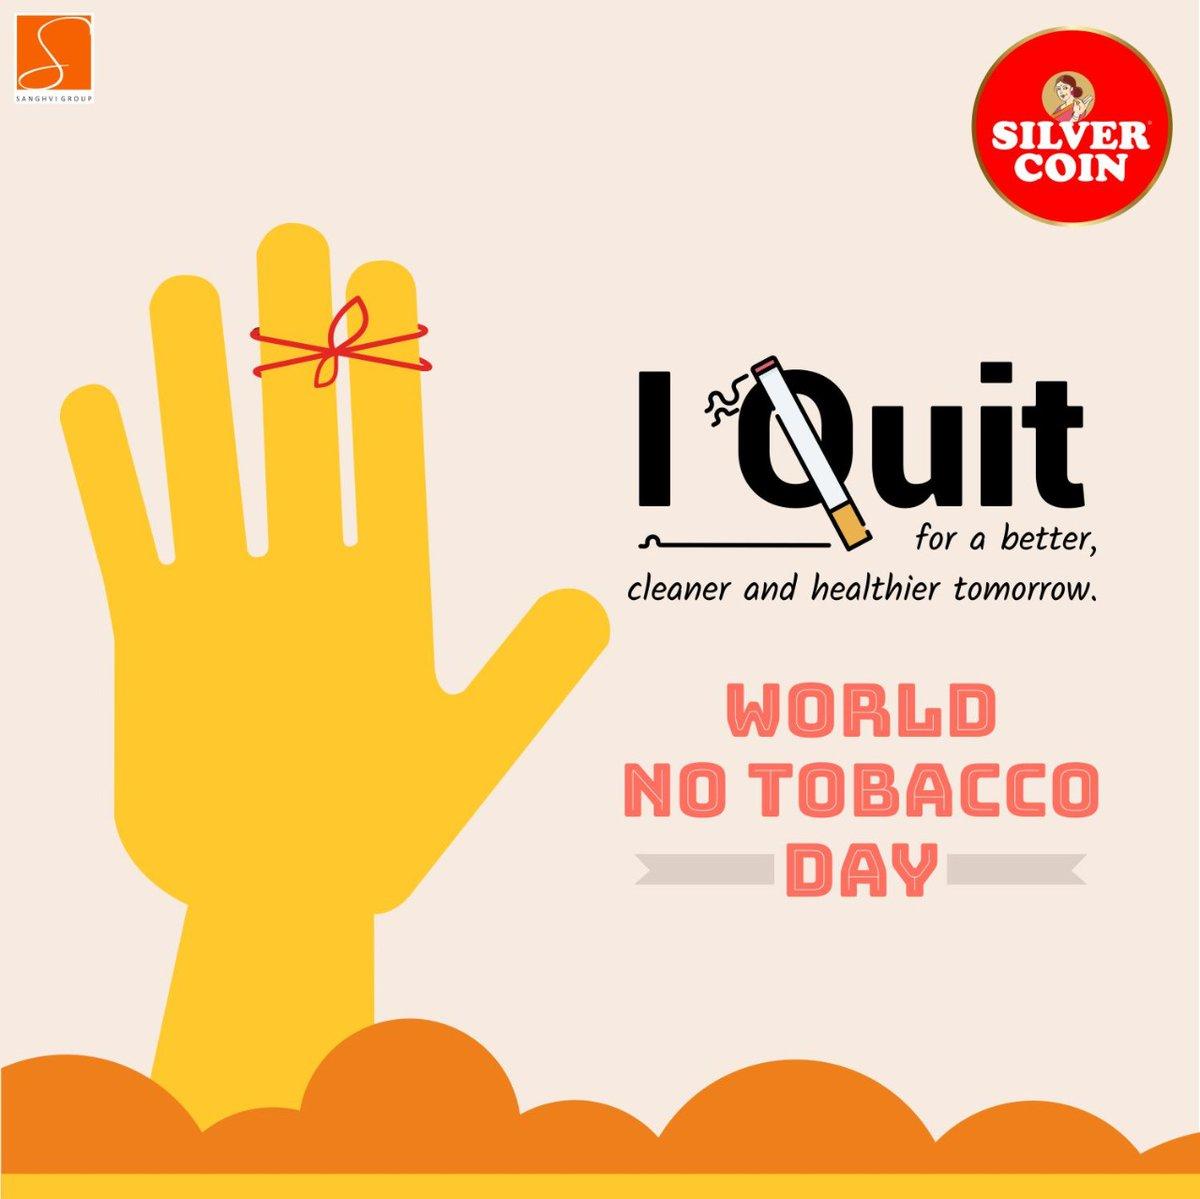 Puff on happiness not smokes! Choose a𝐡𝐚𝐩𝐩𝐲𝐡𝐞𝐚𝐥𝐭𝐡𝐲𝐥𝐢𝐟𝐞.  #WorldNoTobaccoDay #tobacco #tobaccofree #nosmoking #notobacco #smoking #life #health #May #awareness #care #day #vape #vaping #Sunday #bhfyp #silvercoin #atta #healthyfood #foodblogger #foodie #recipepic.twitter.com/LNZGDnhyZS